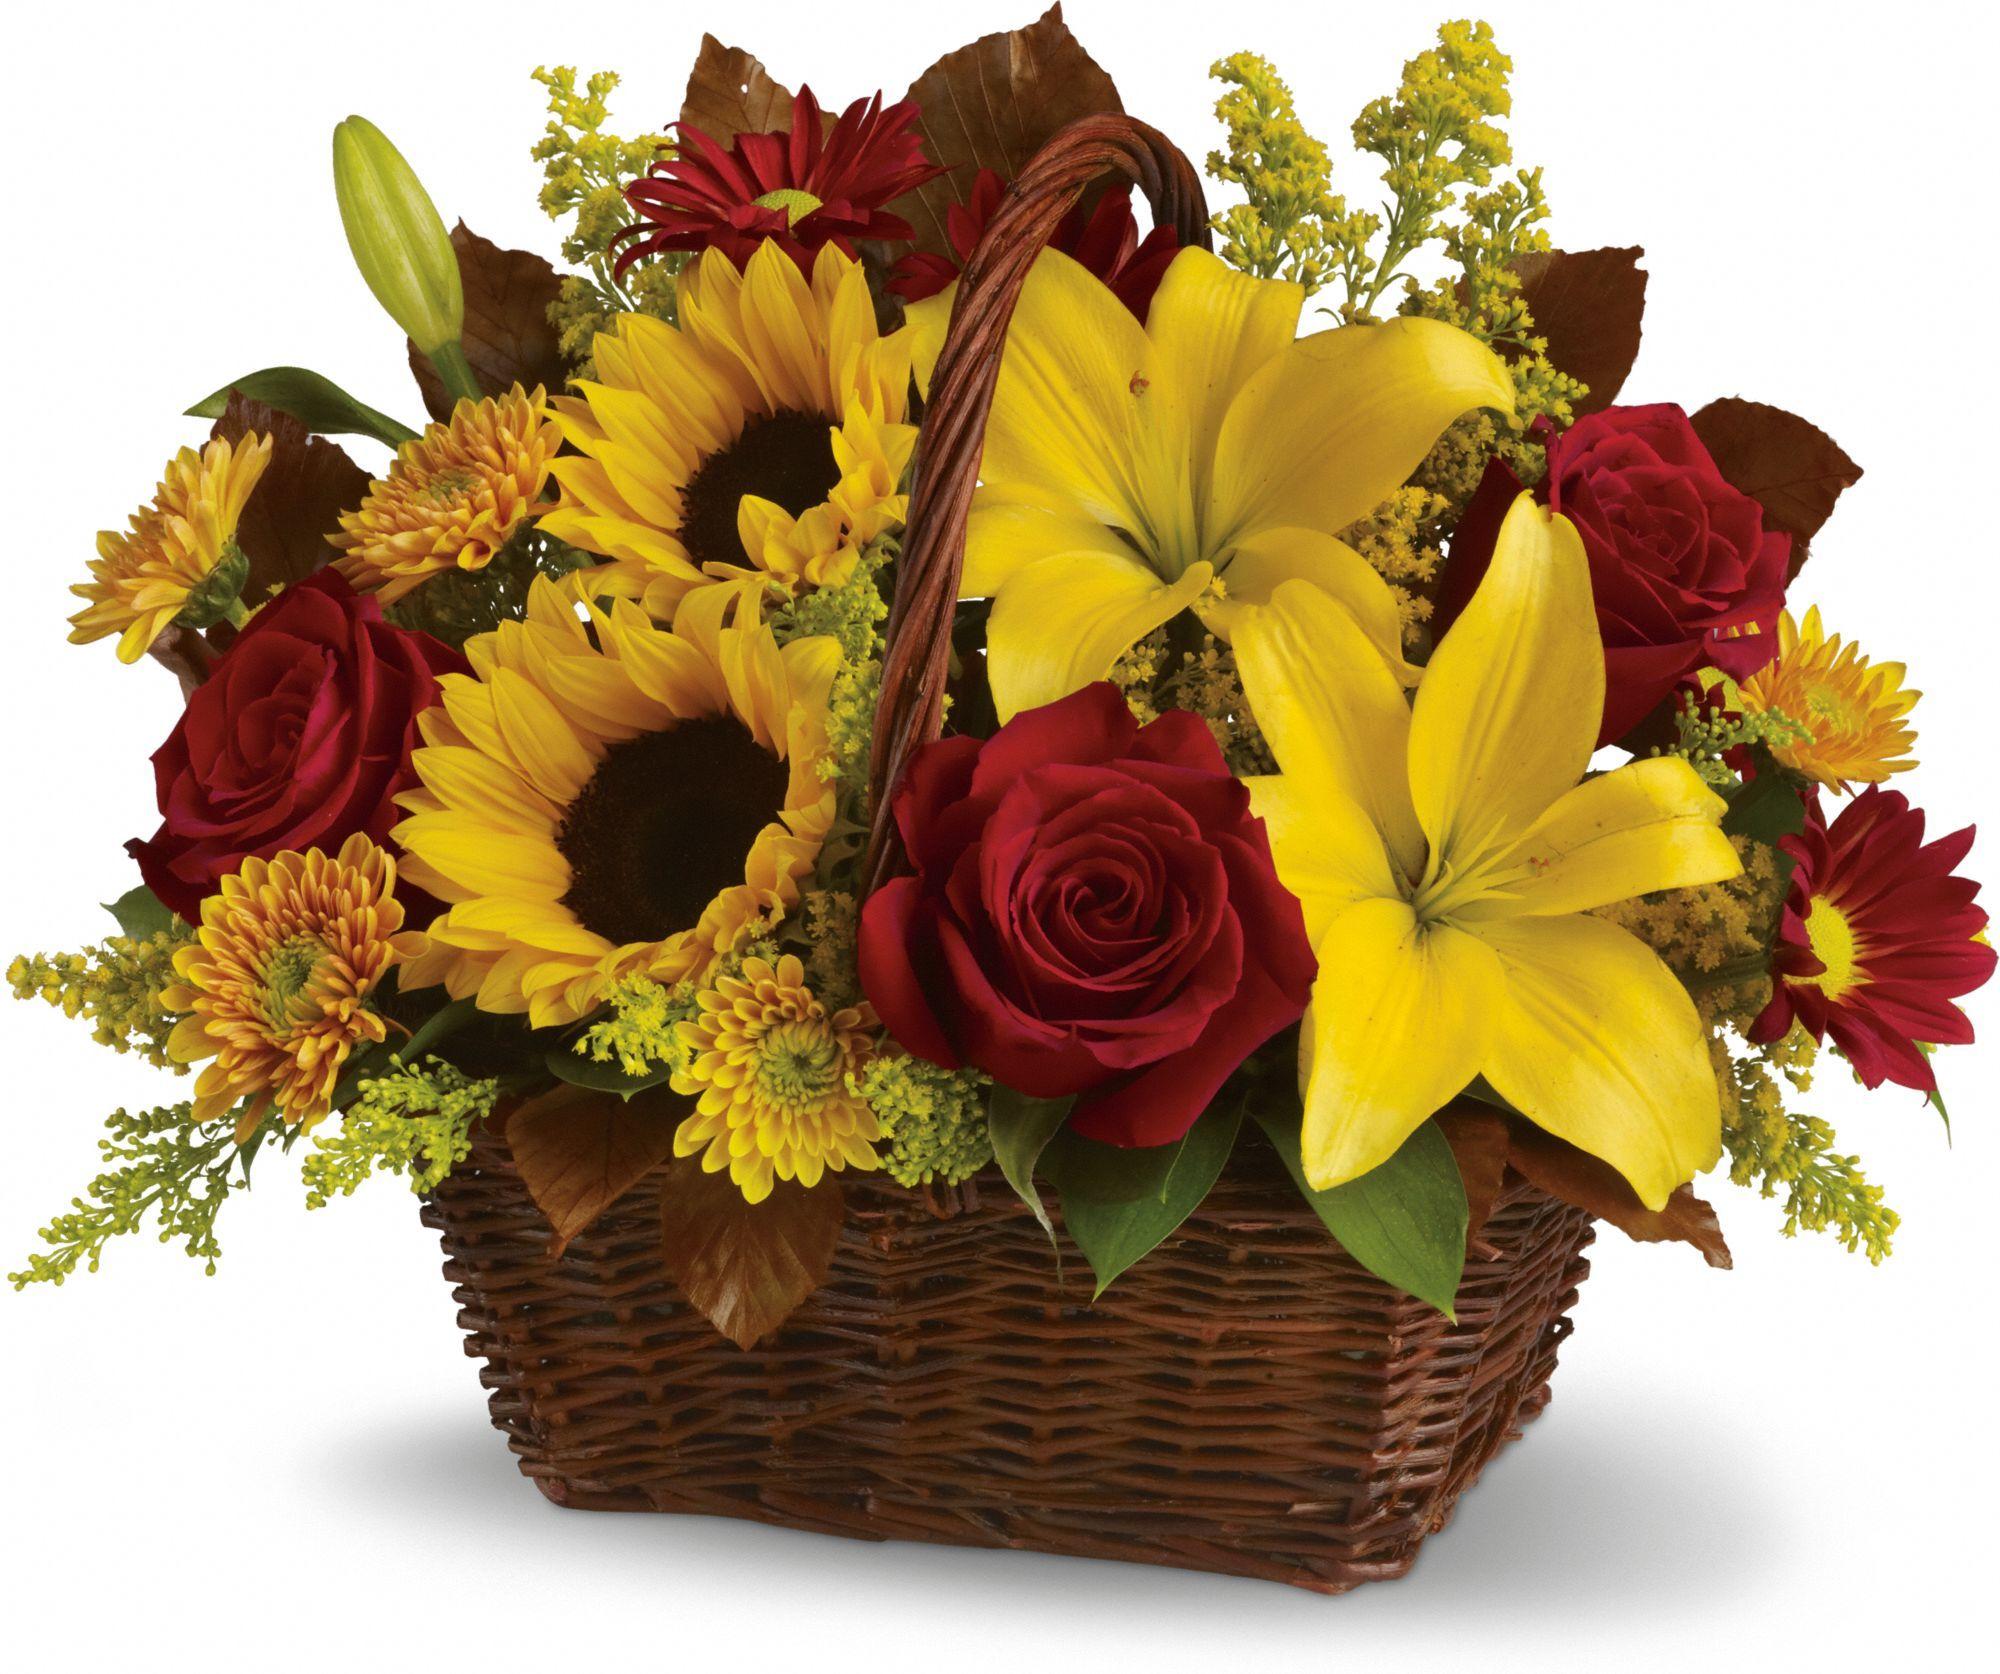 Golden Days Basket Basket flower arrangements, Flower